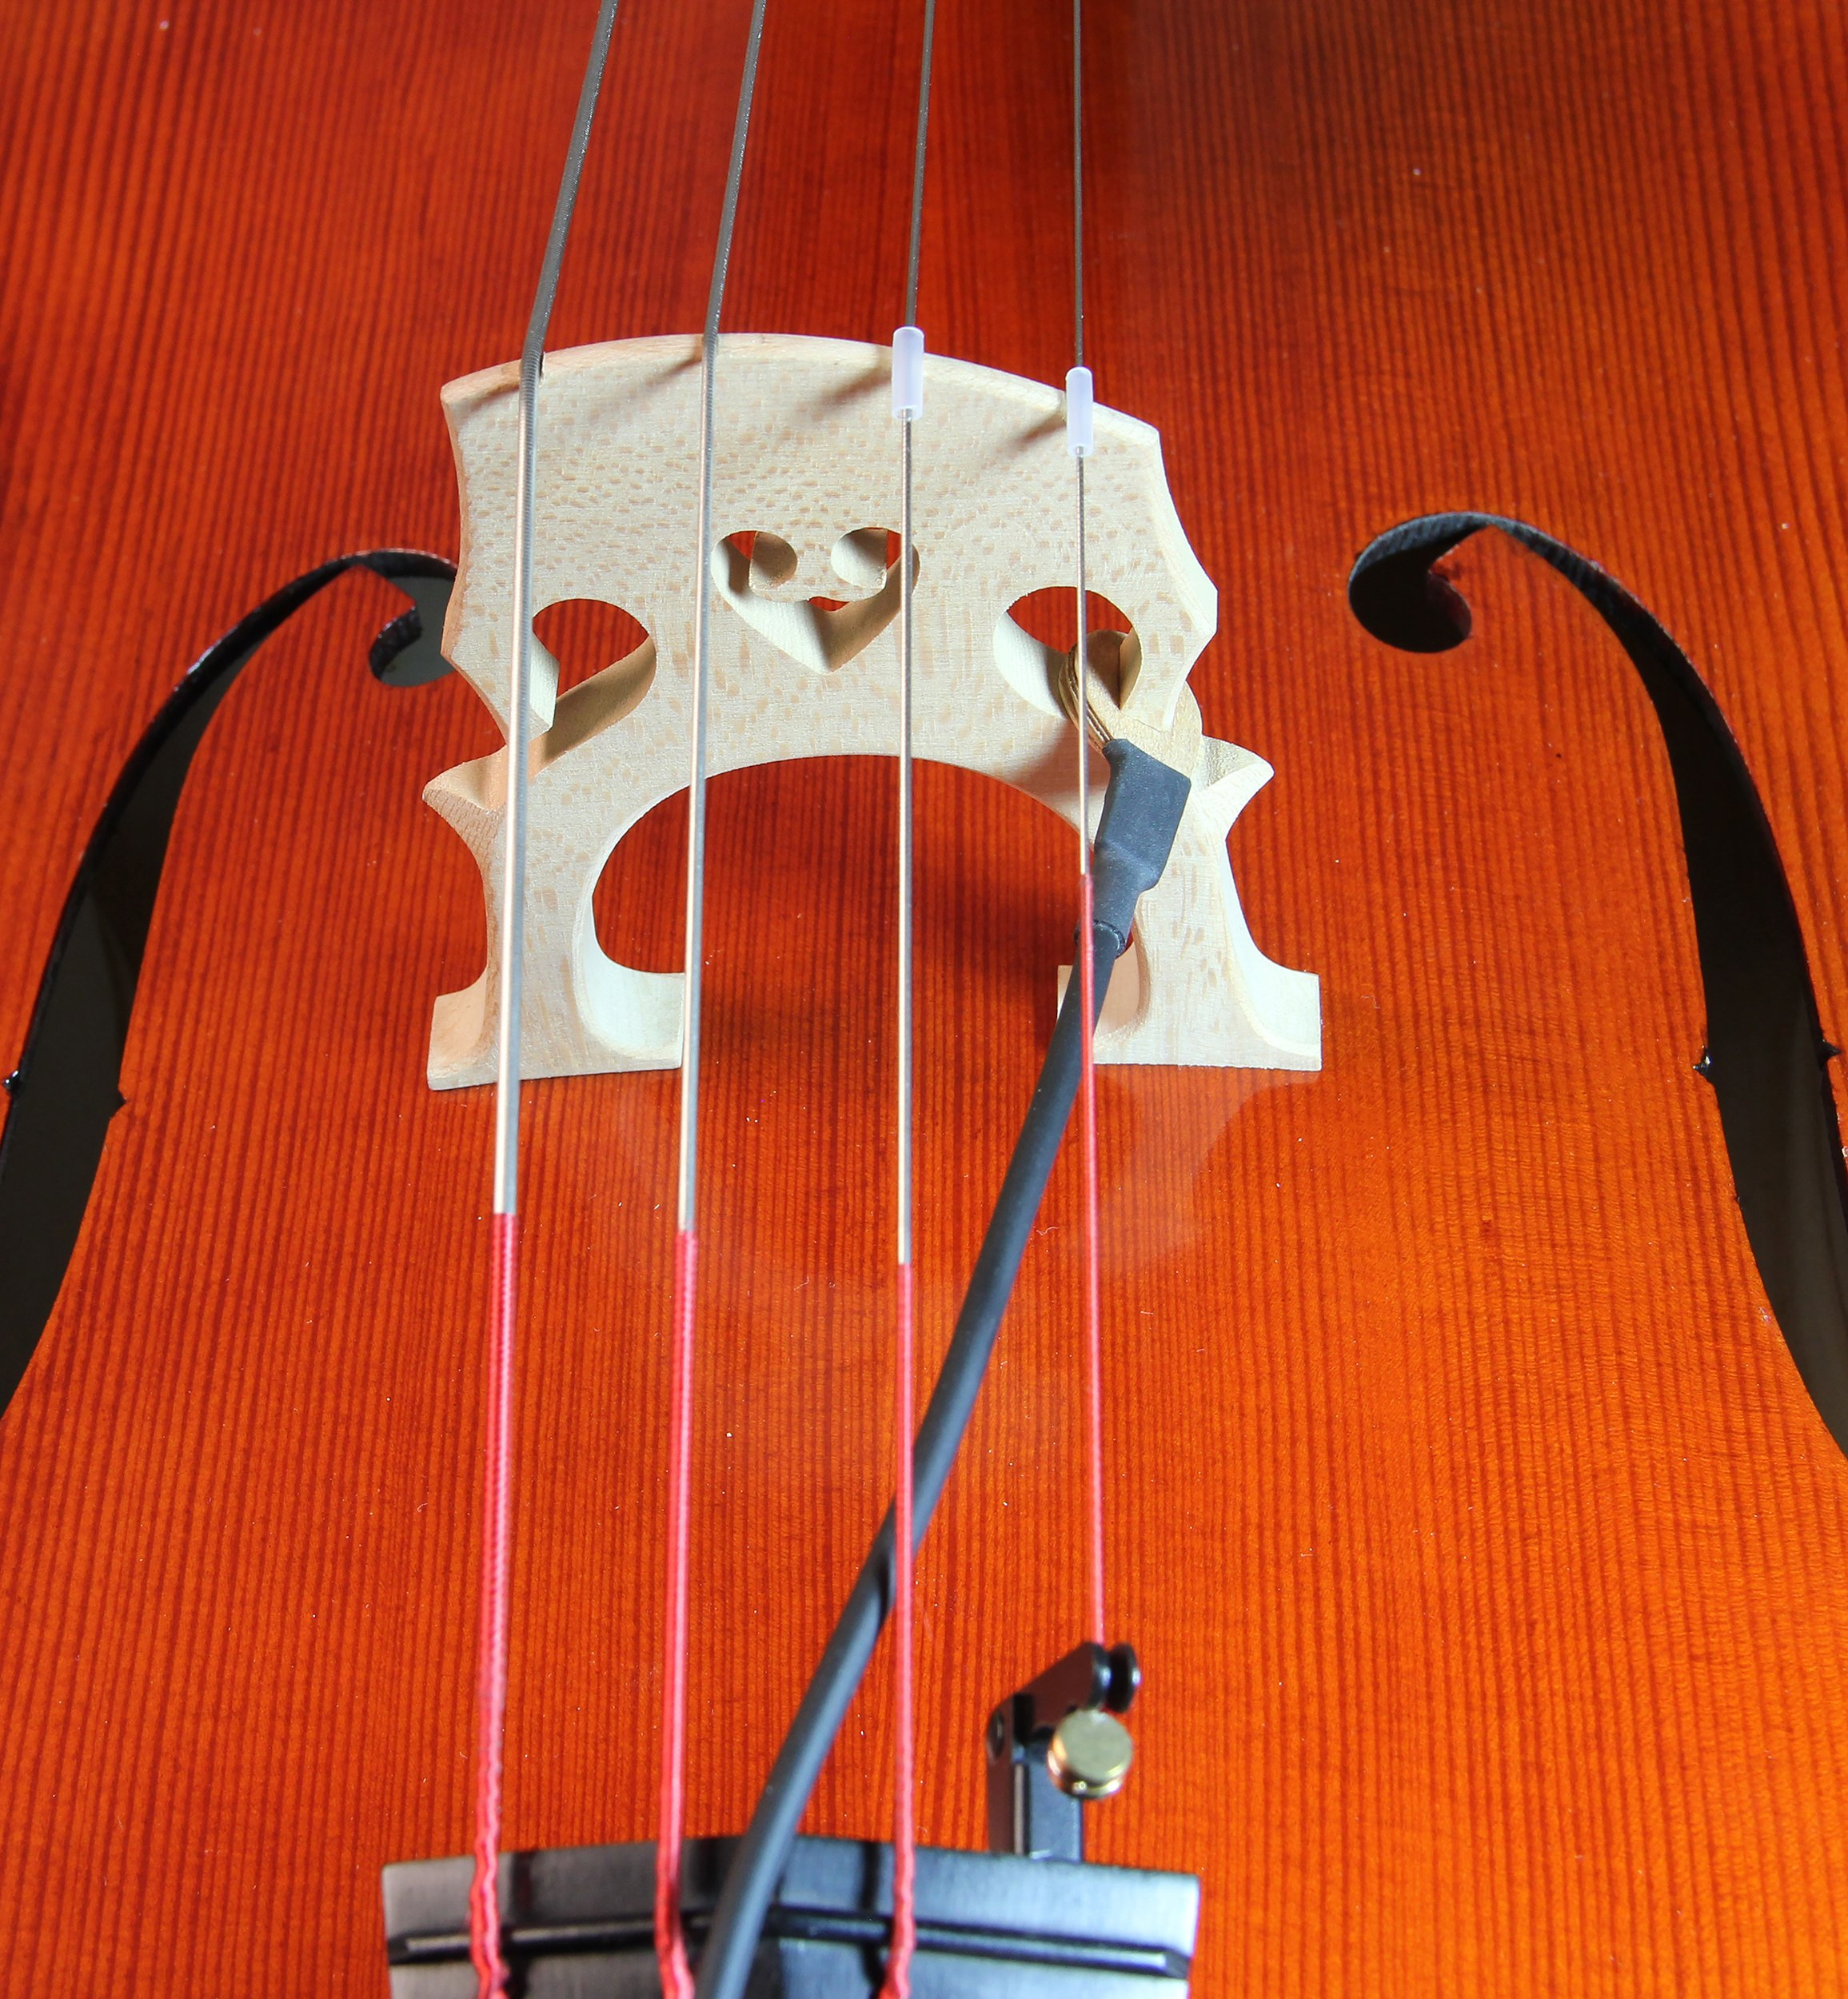 KNA VC-1 Portable Piezo Pickup for Cello by KNA Pickups (Image #3)